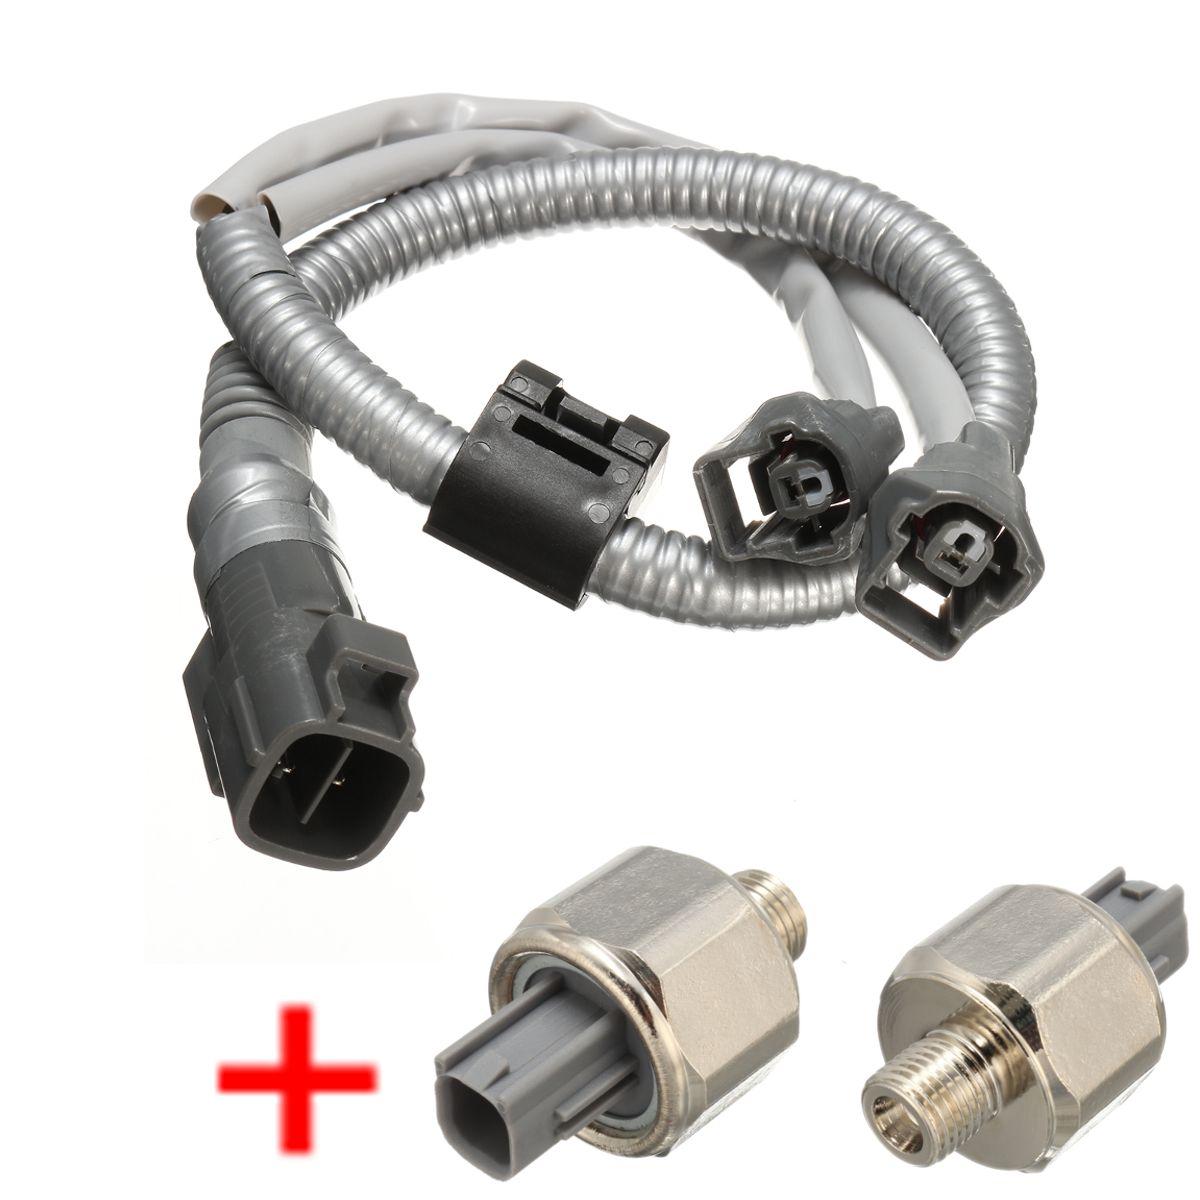 medium resolution of 2 knock sensor with wire harness for toyota camry avalon solara highlander es330 for lexus rx300 8221933030 82219 07010 in detonation sensor from